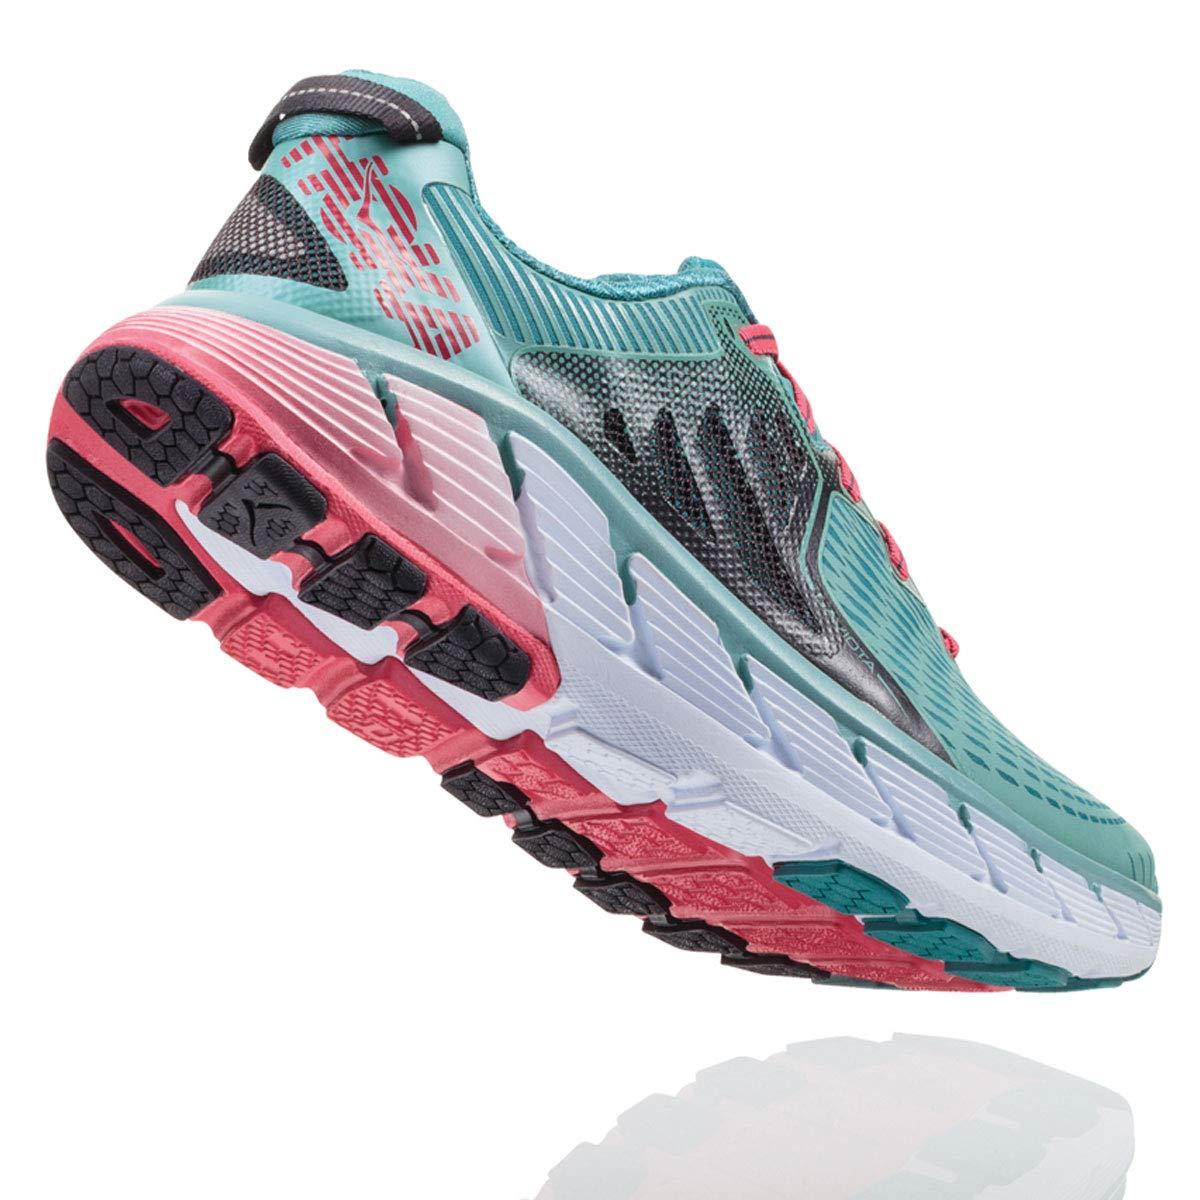 Hoka One One Gaviota Running schuhe damen Laufsport Canton Grün Blau Slate 2018 Laufsport damen Schuhe 7e090c